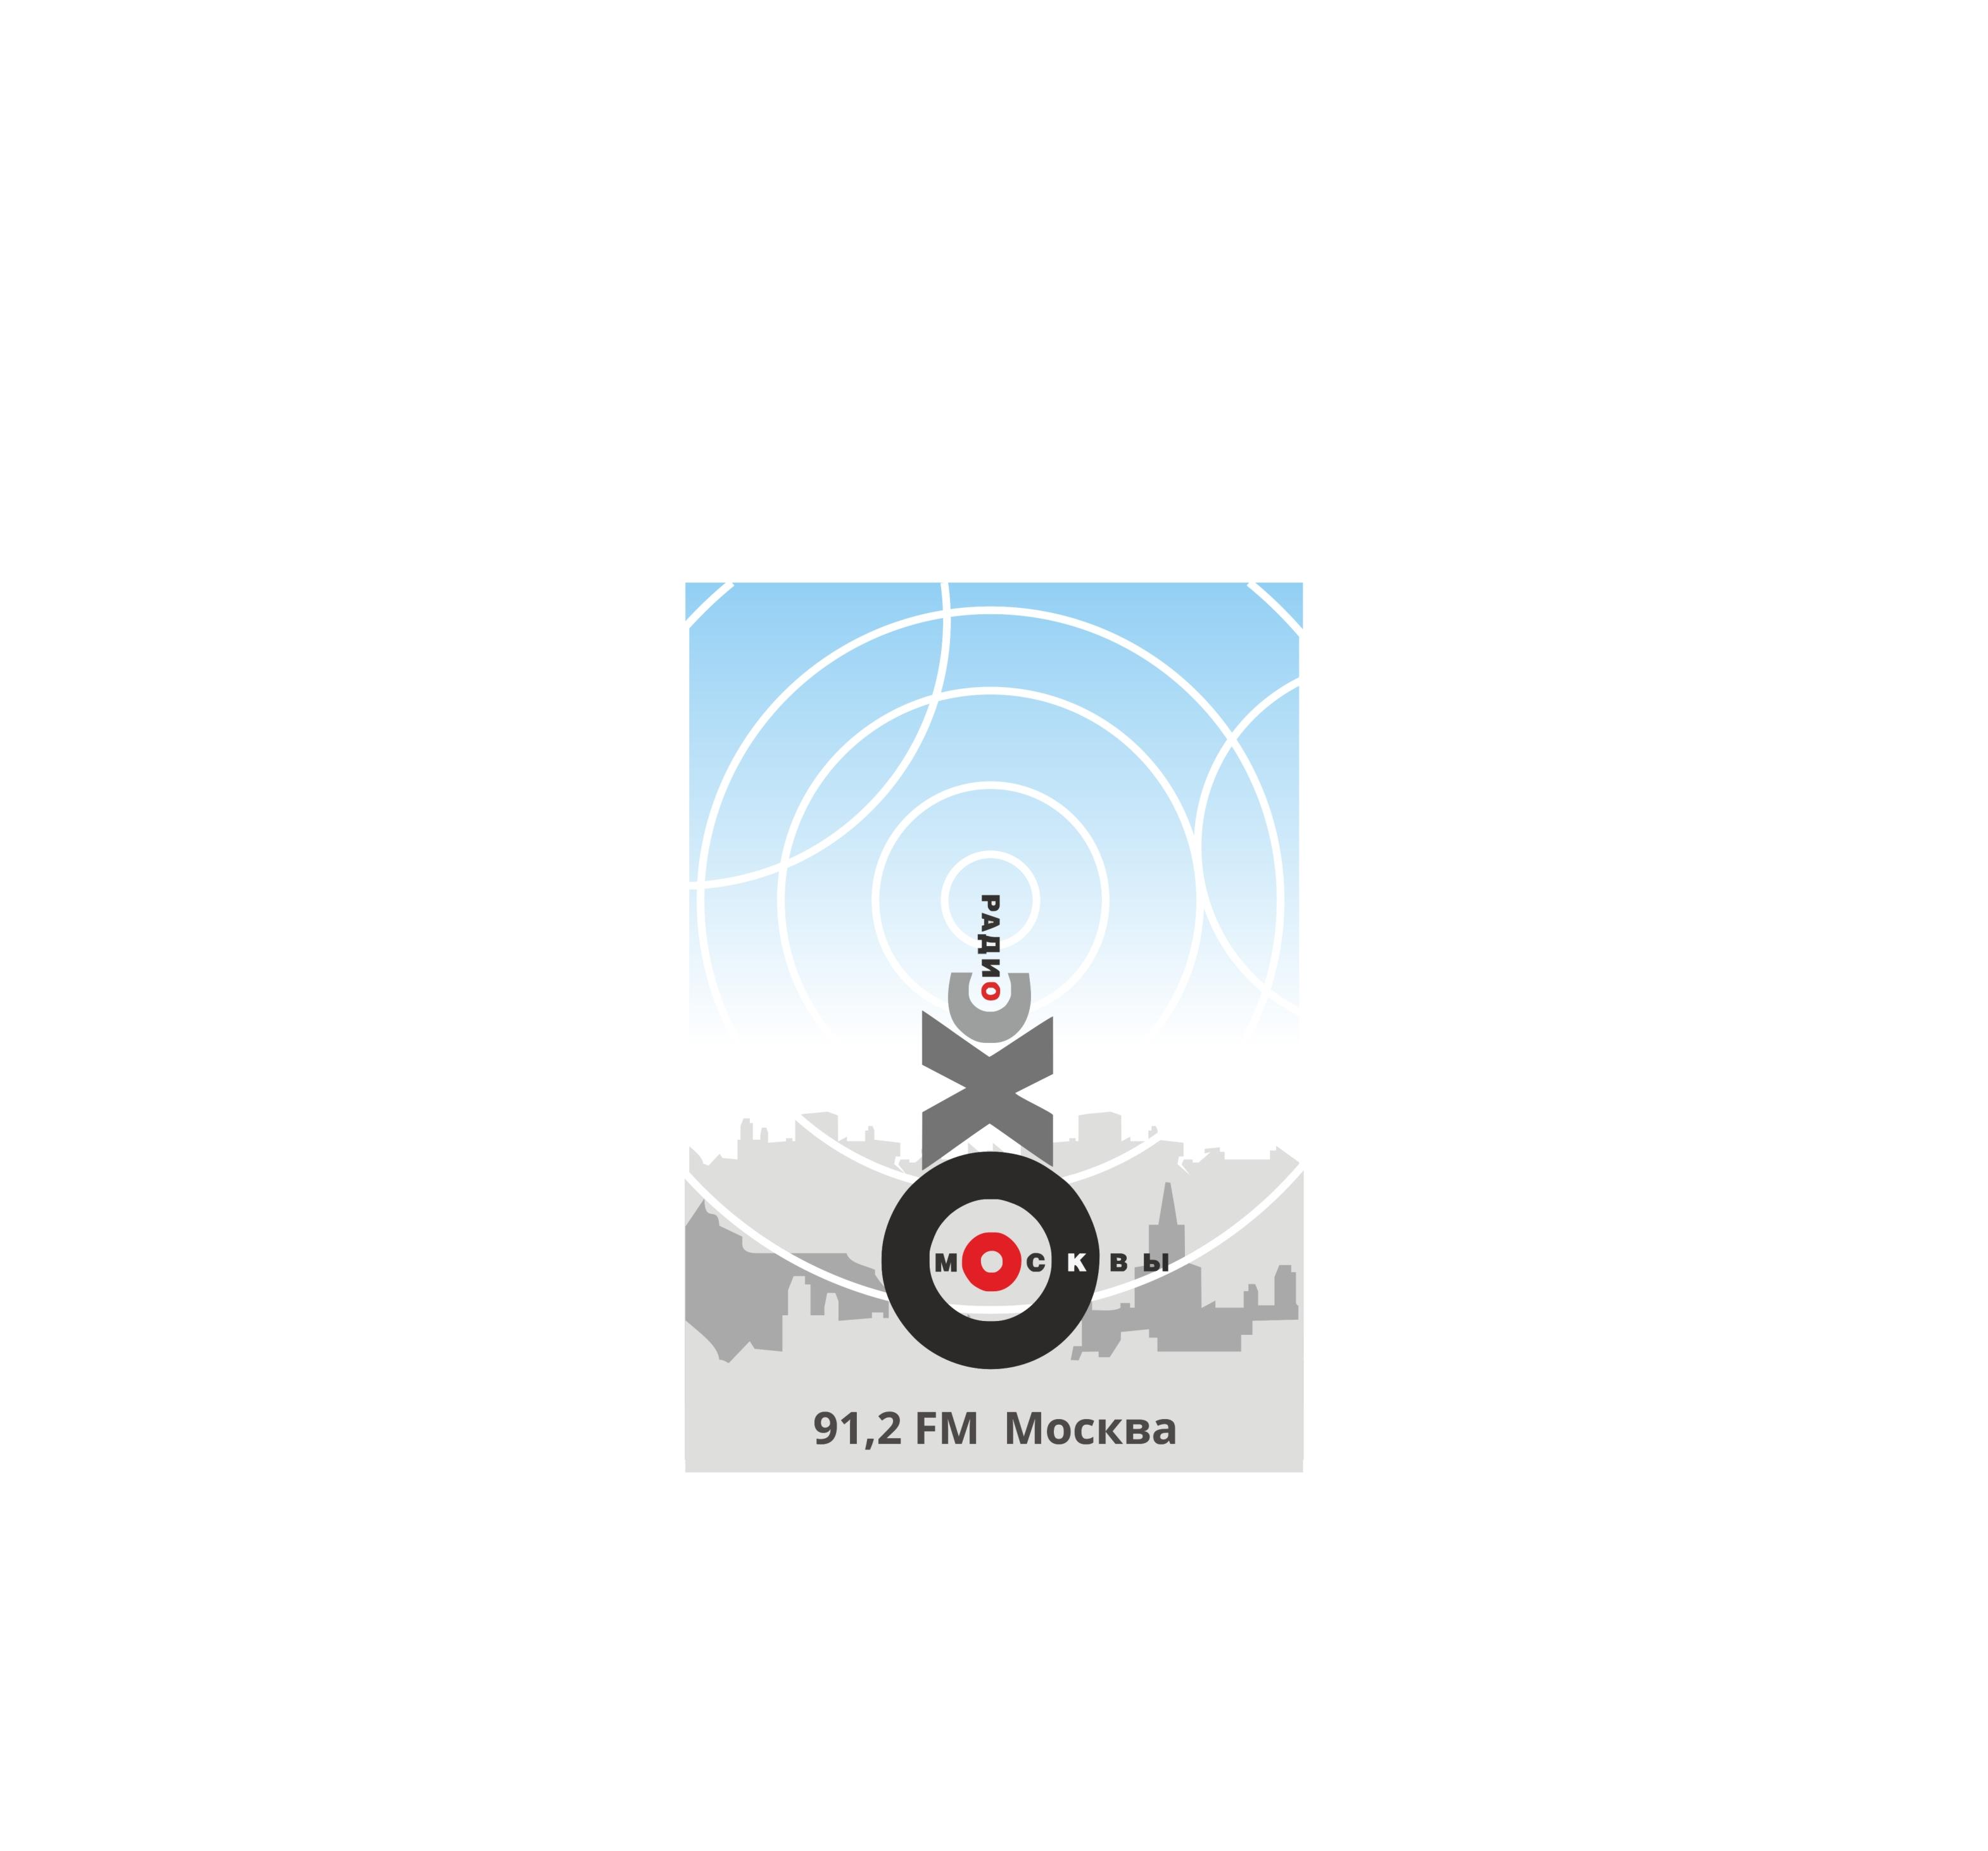 Дизайн логотипа р/с Эхо Москвы. фото f_898562271153378c.jpg